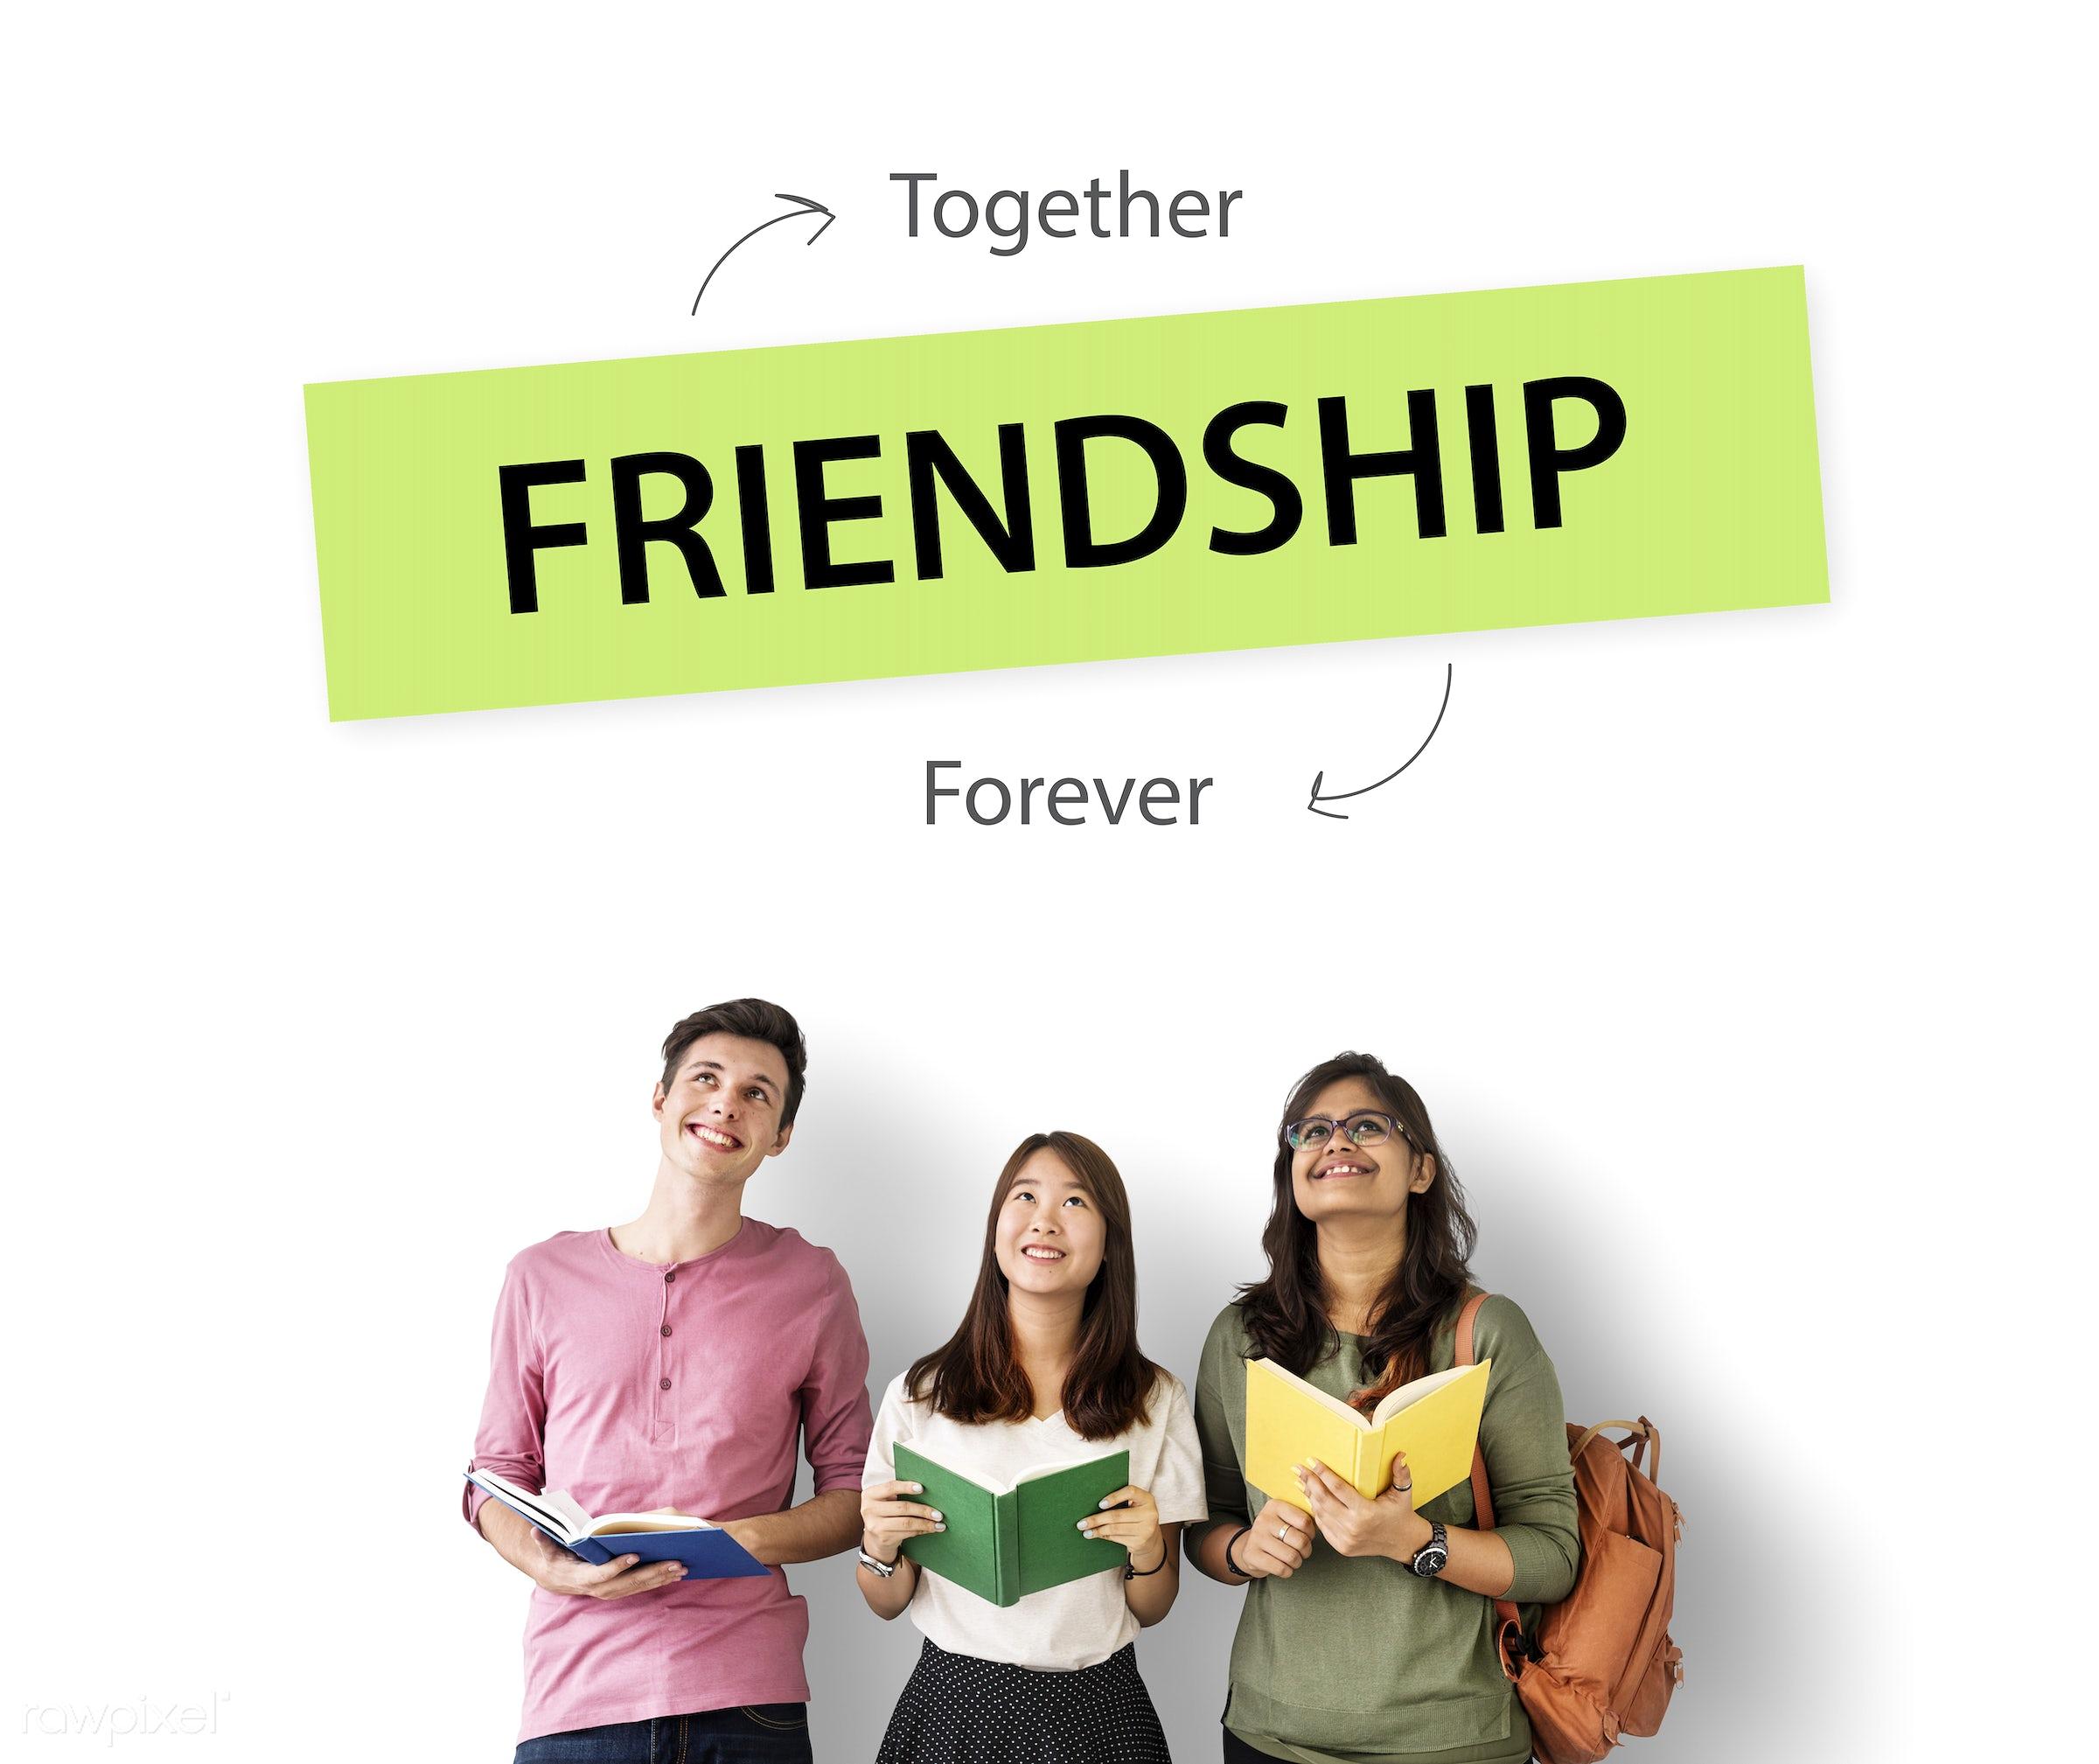 caucasian, african descent, asian, book, care, community, cooperation, diversity, enjoyment, forever, friends, friendship,...